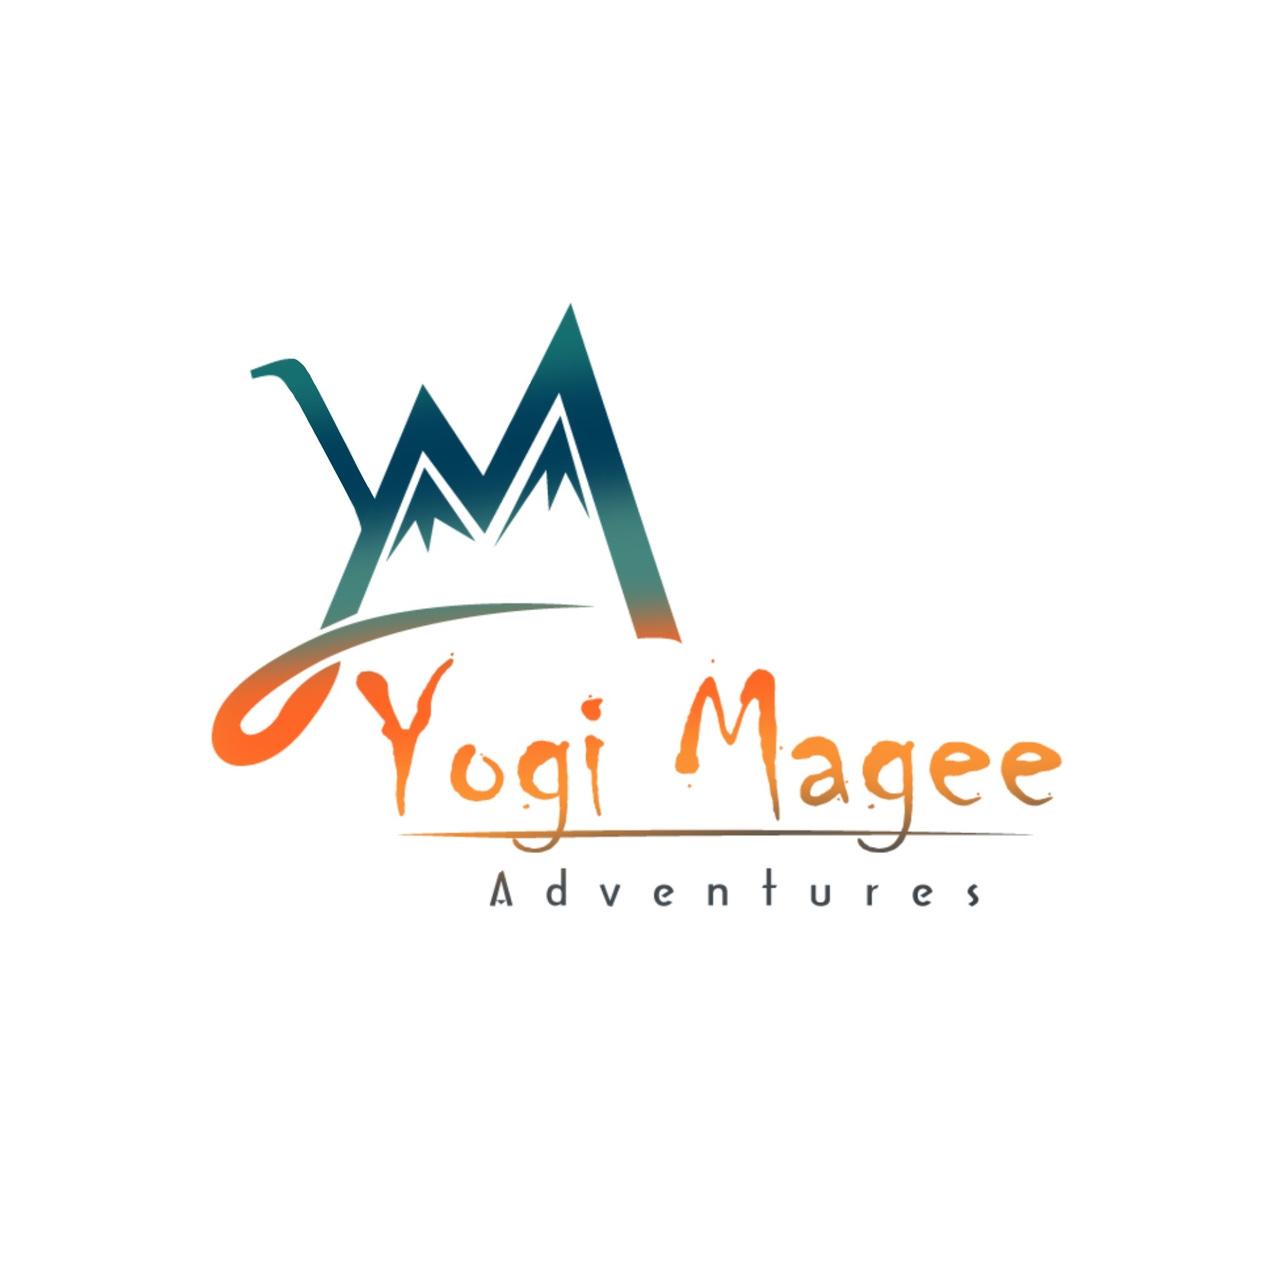 Yogi Magee's Adventures